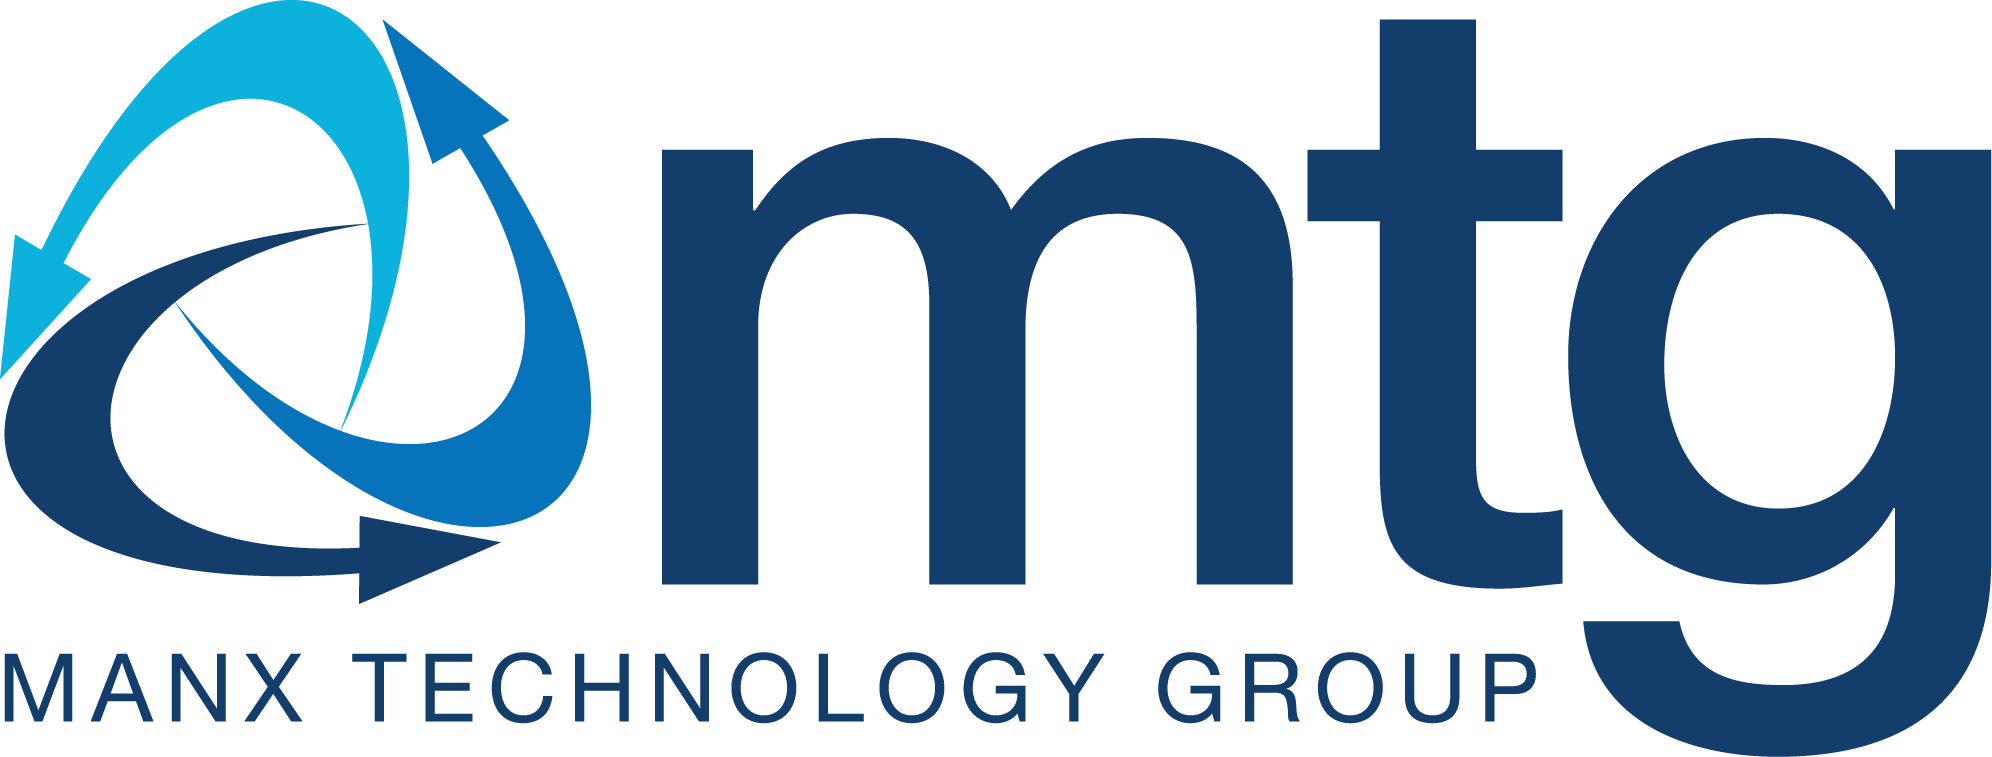 Small Business Firewall Guide : Manx Technology Group